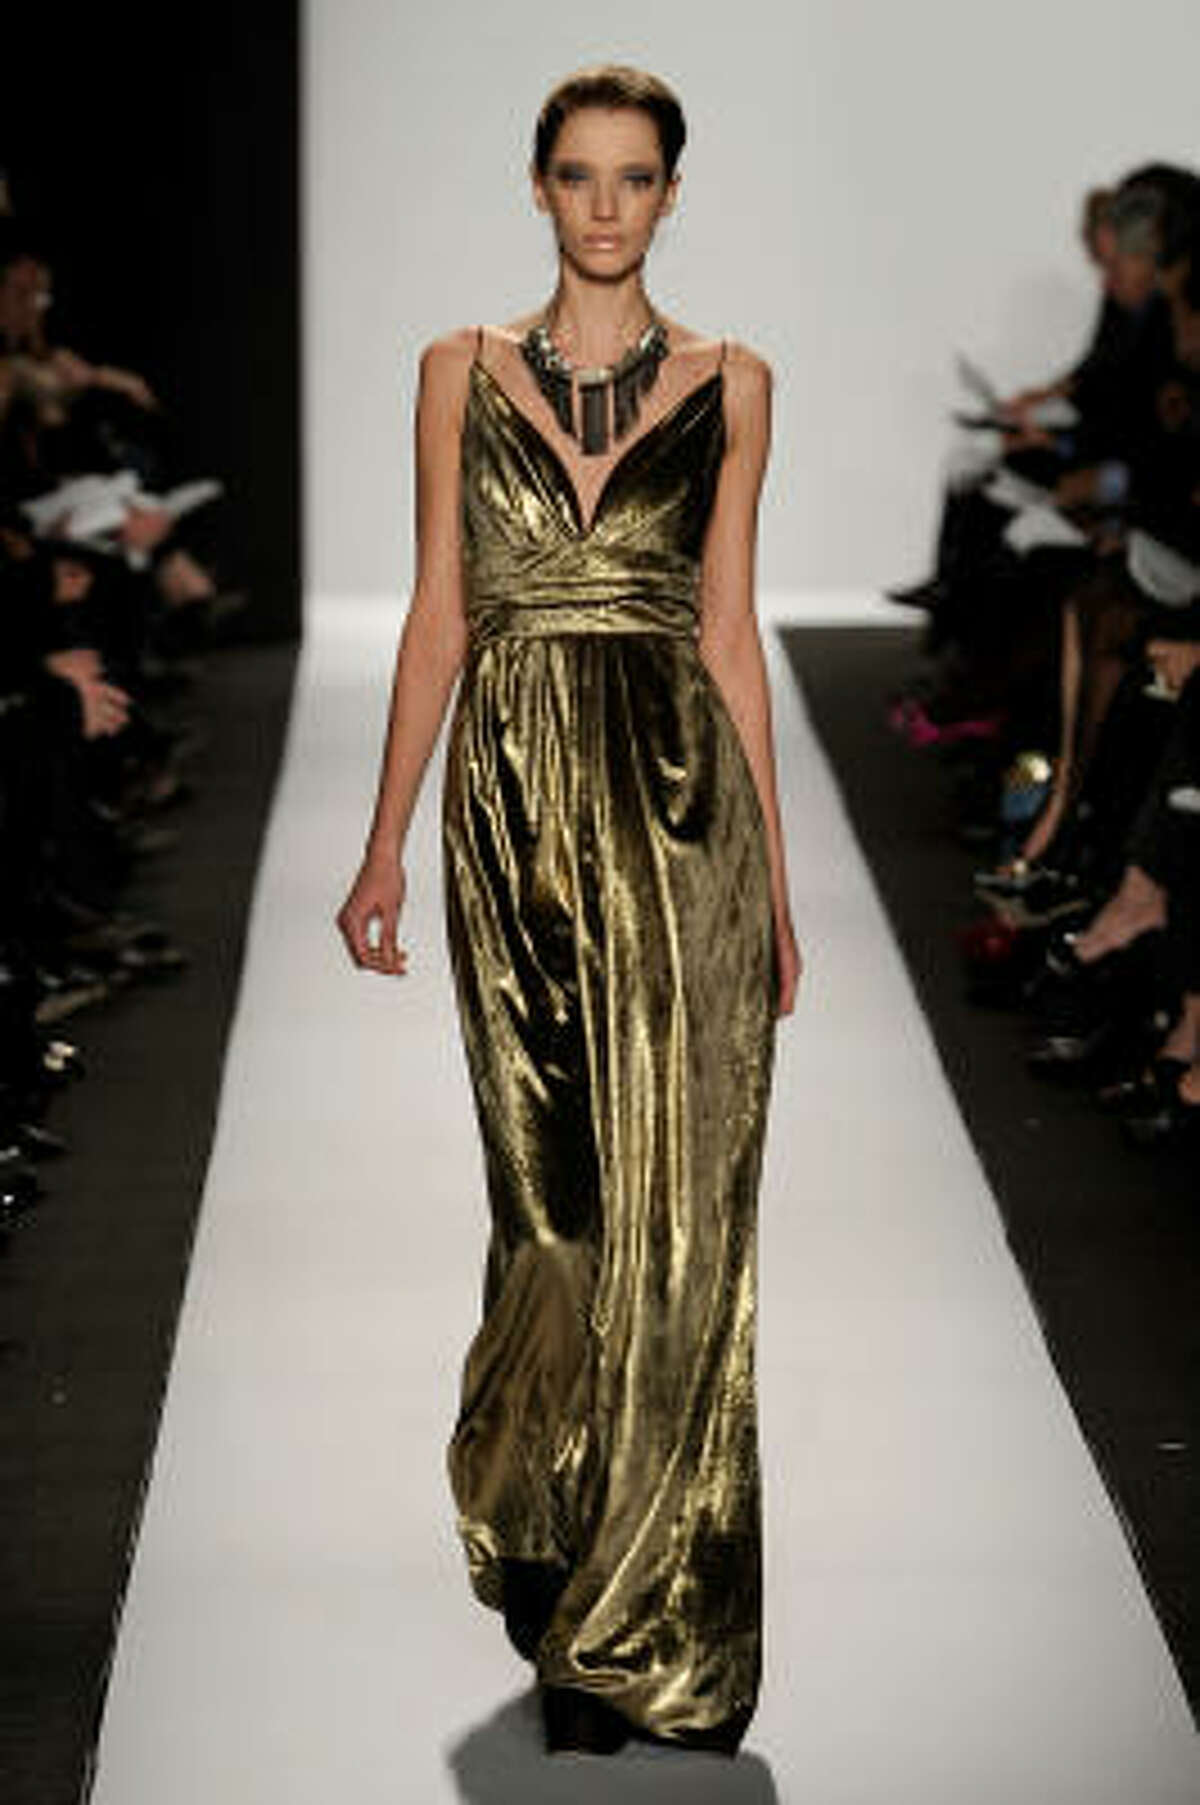 Badgley Mischka liquid gold evening gown.